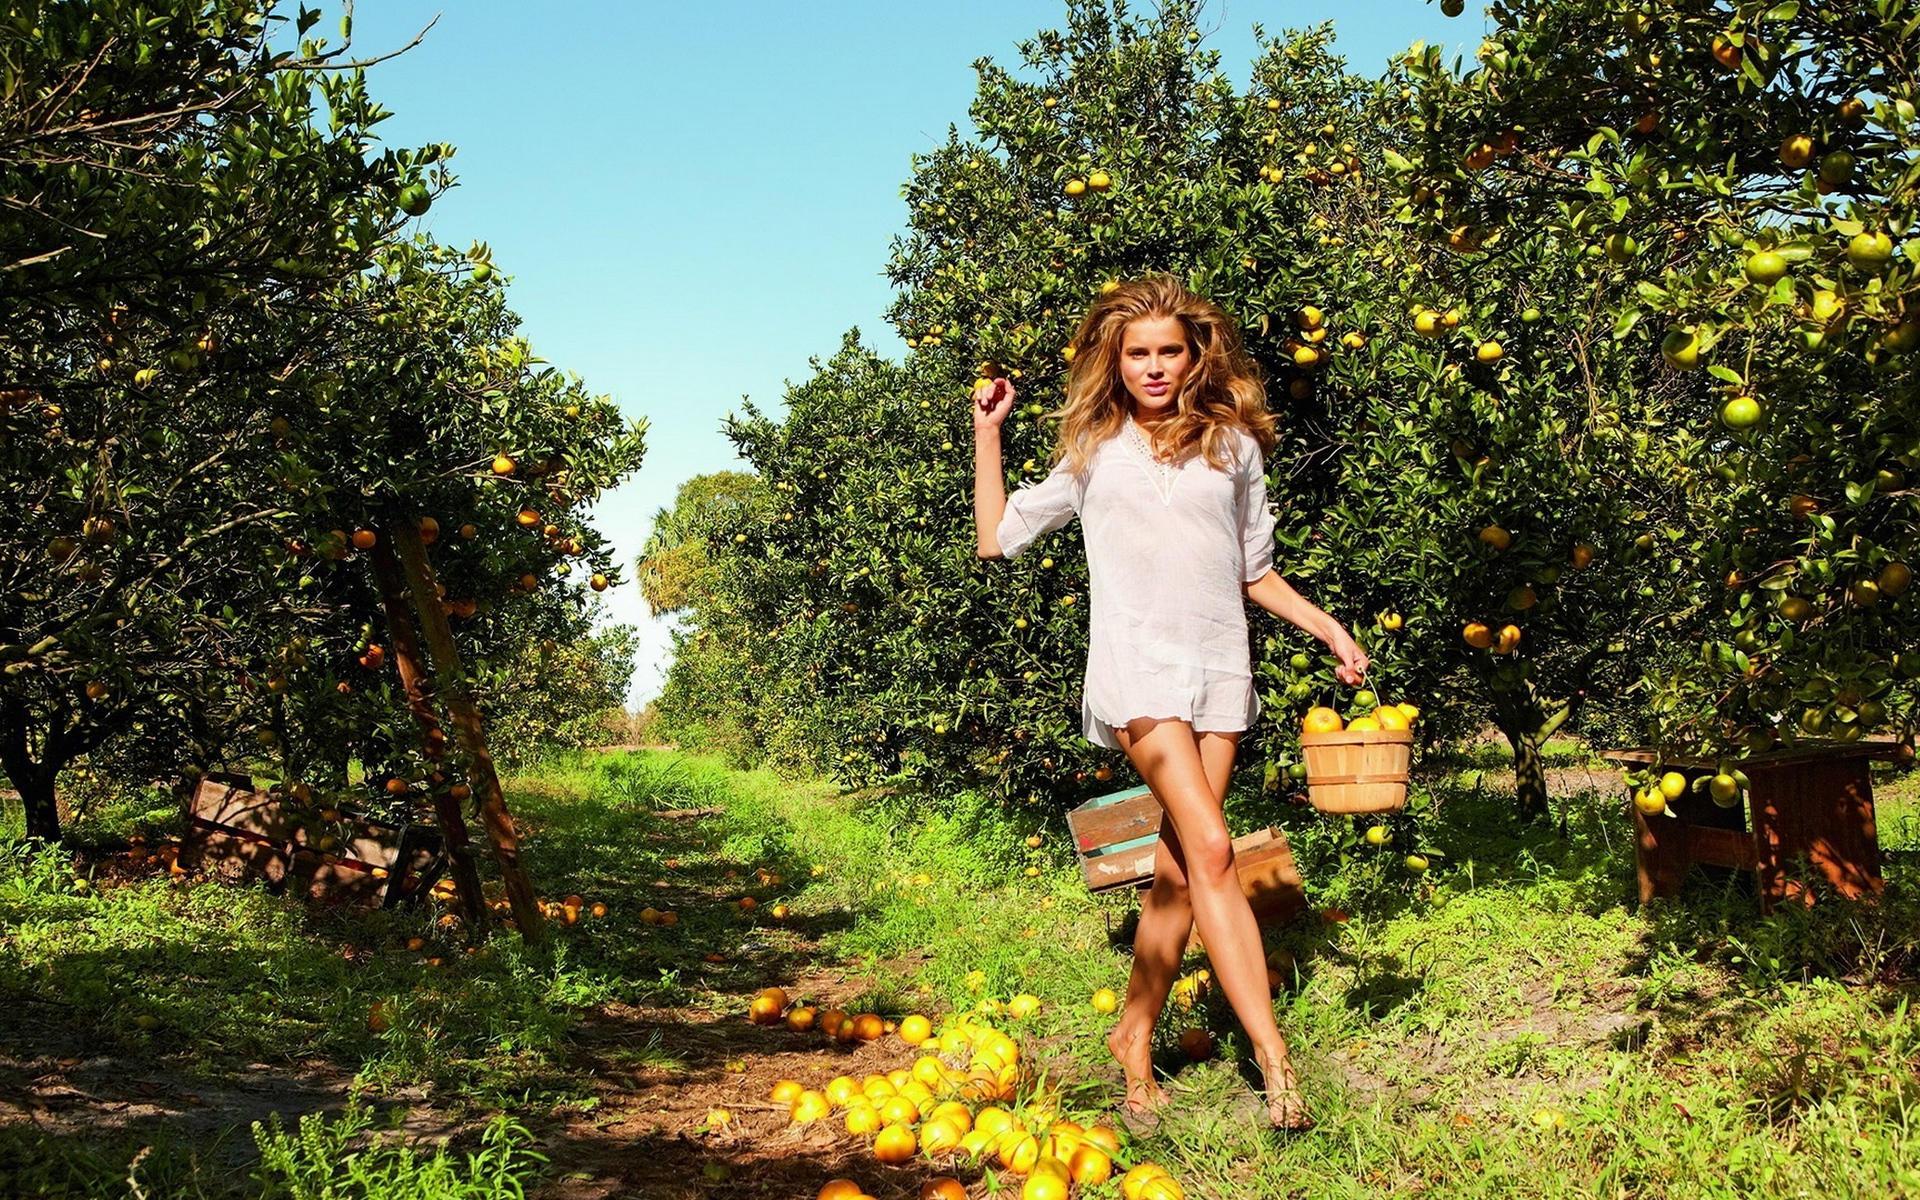 Фото девушек собирающих яблоки